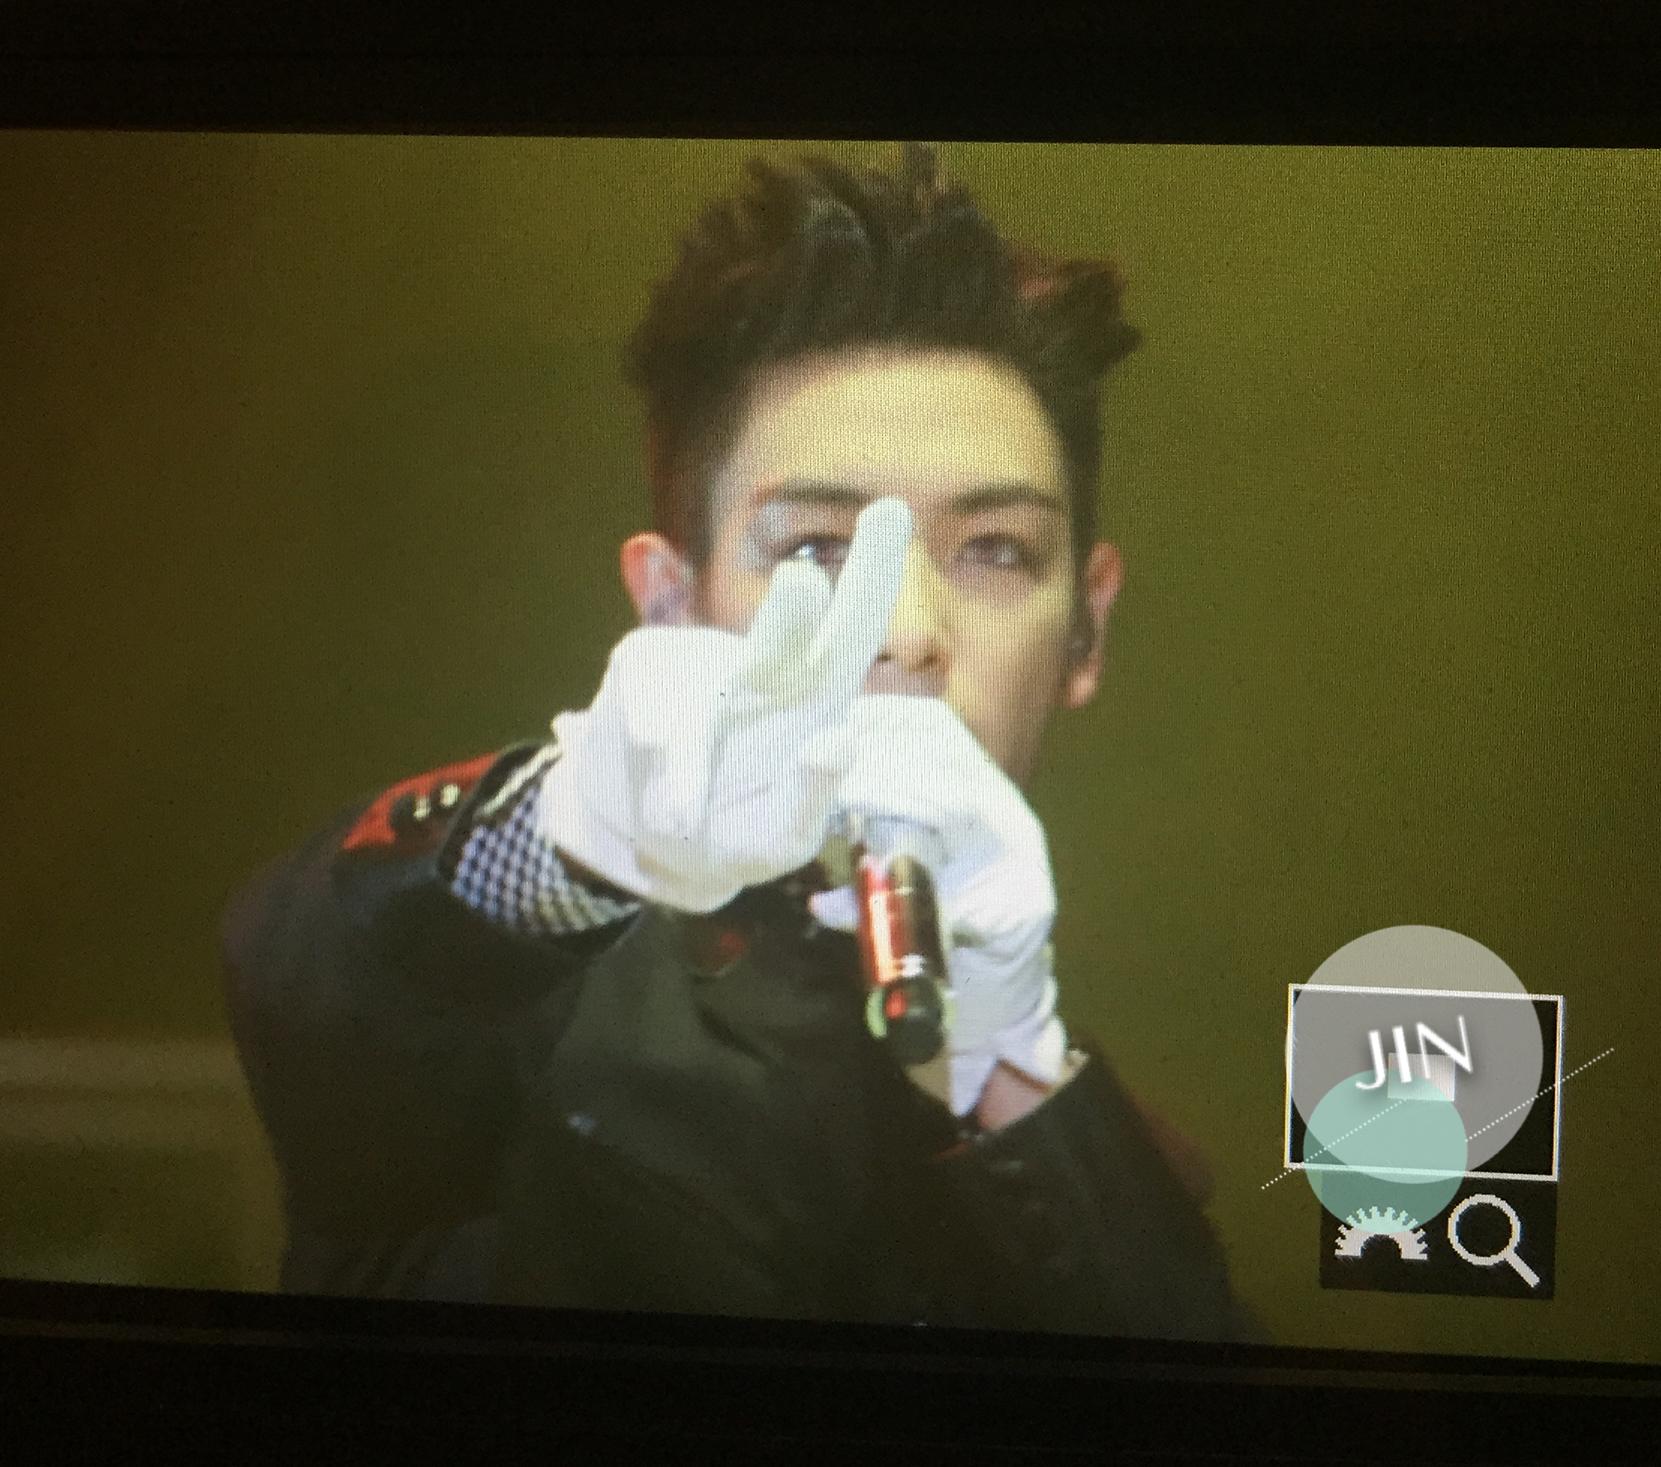 BIGBANG - Made Tour 2015 - Dalian - 26jun2015 - G-Jin - 12.jpg